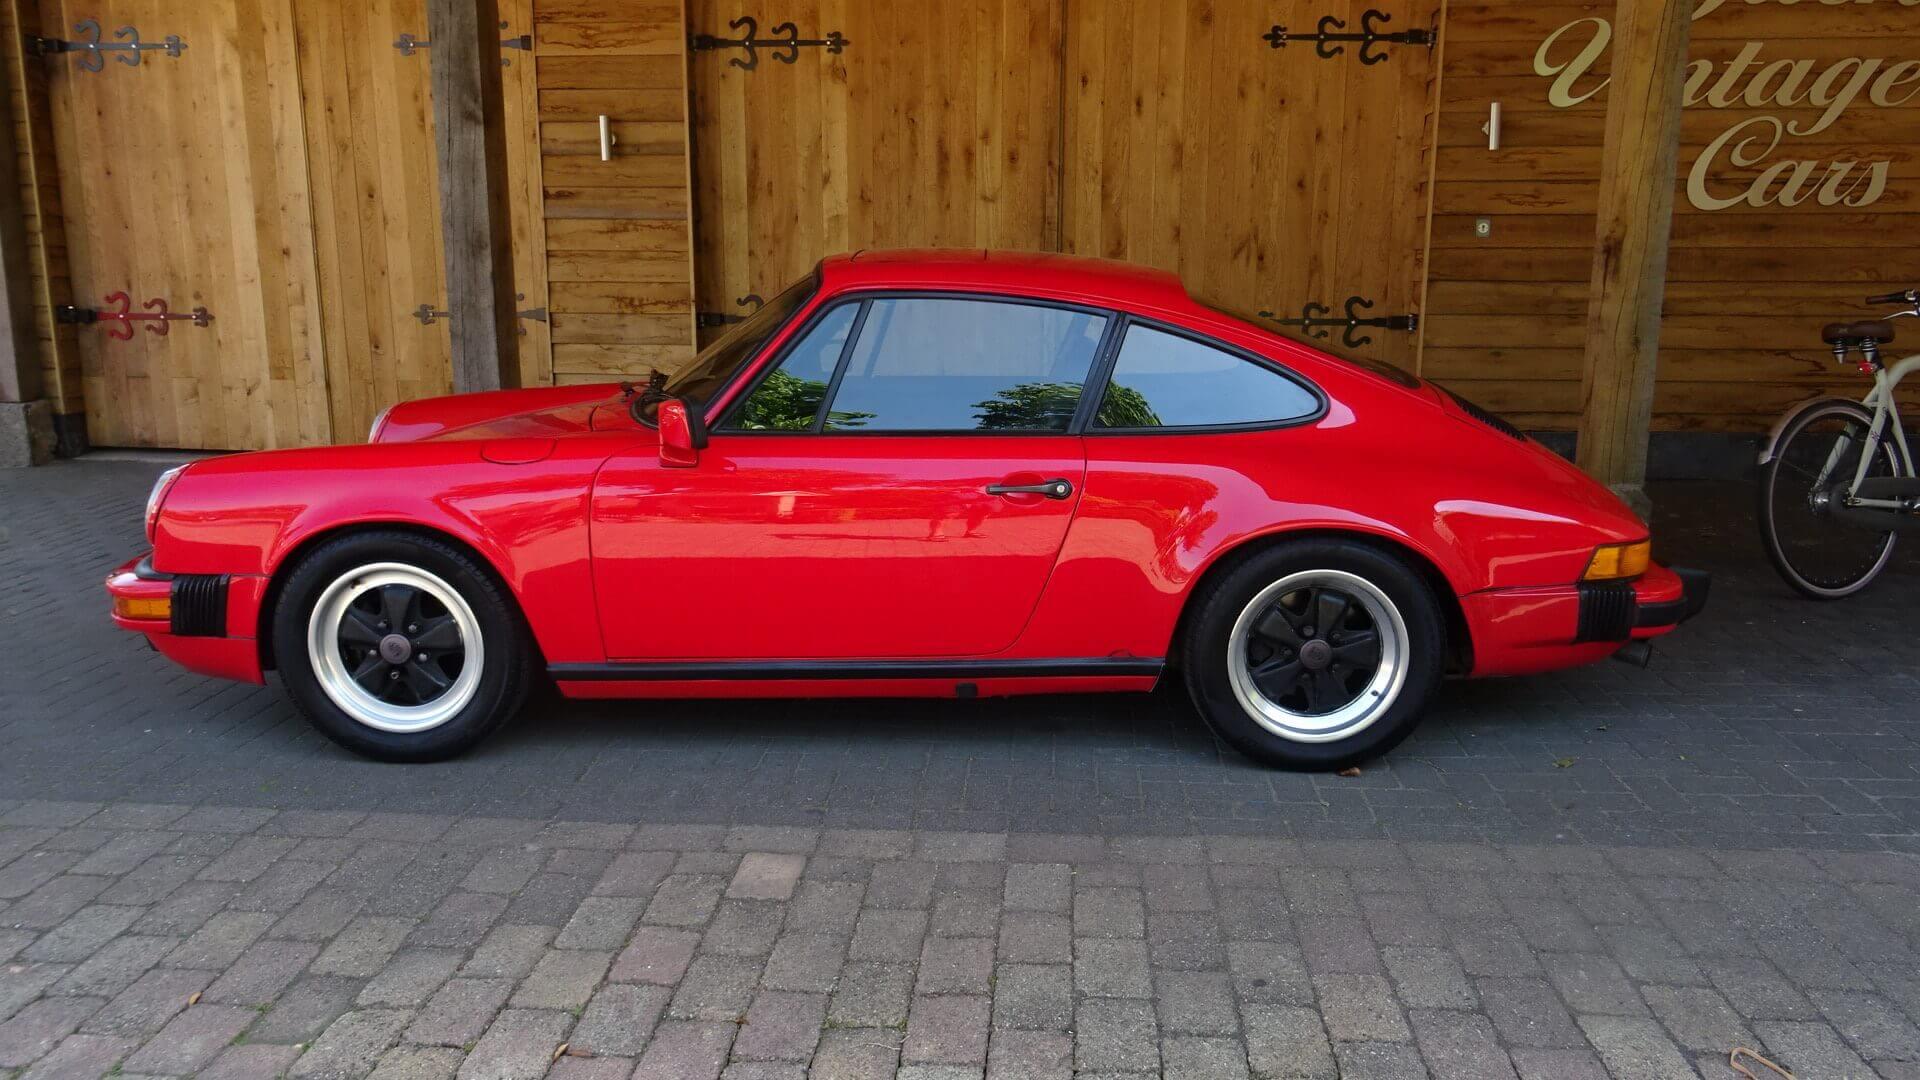 84 porsche 911 coupe union jack vintage cars. Black Bedroom Furniture Sets. Home Design Ideas